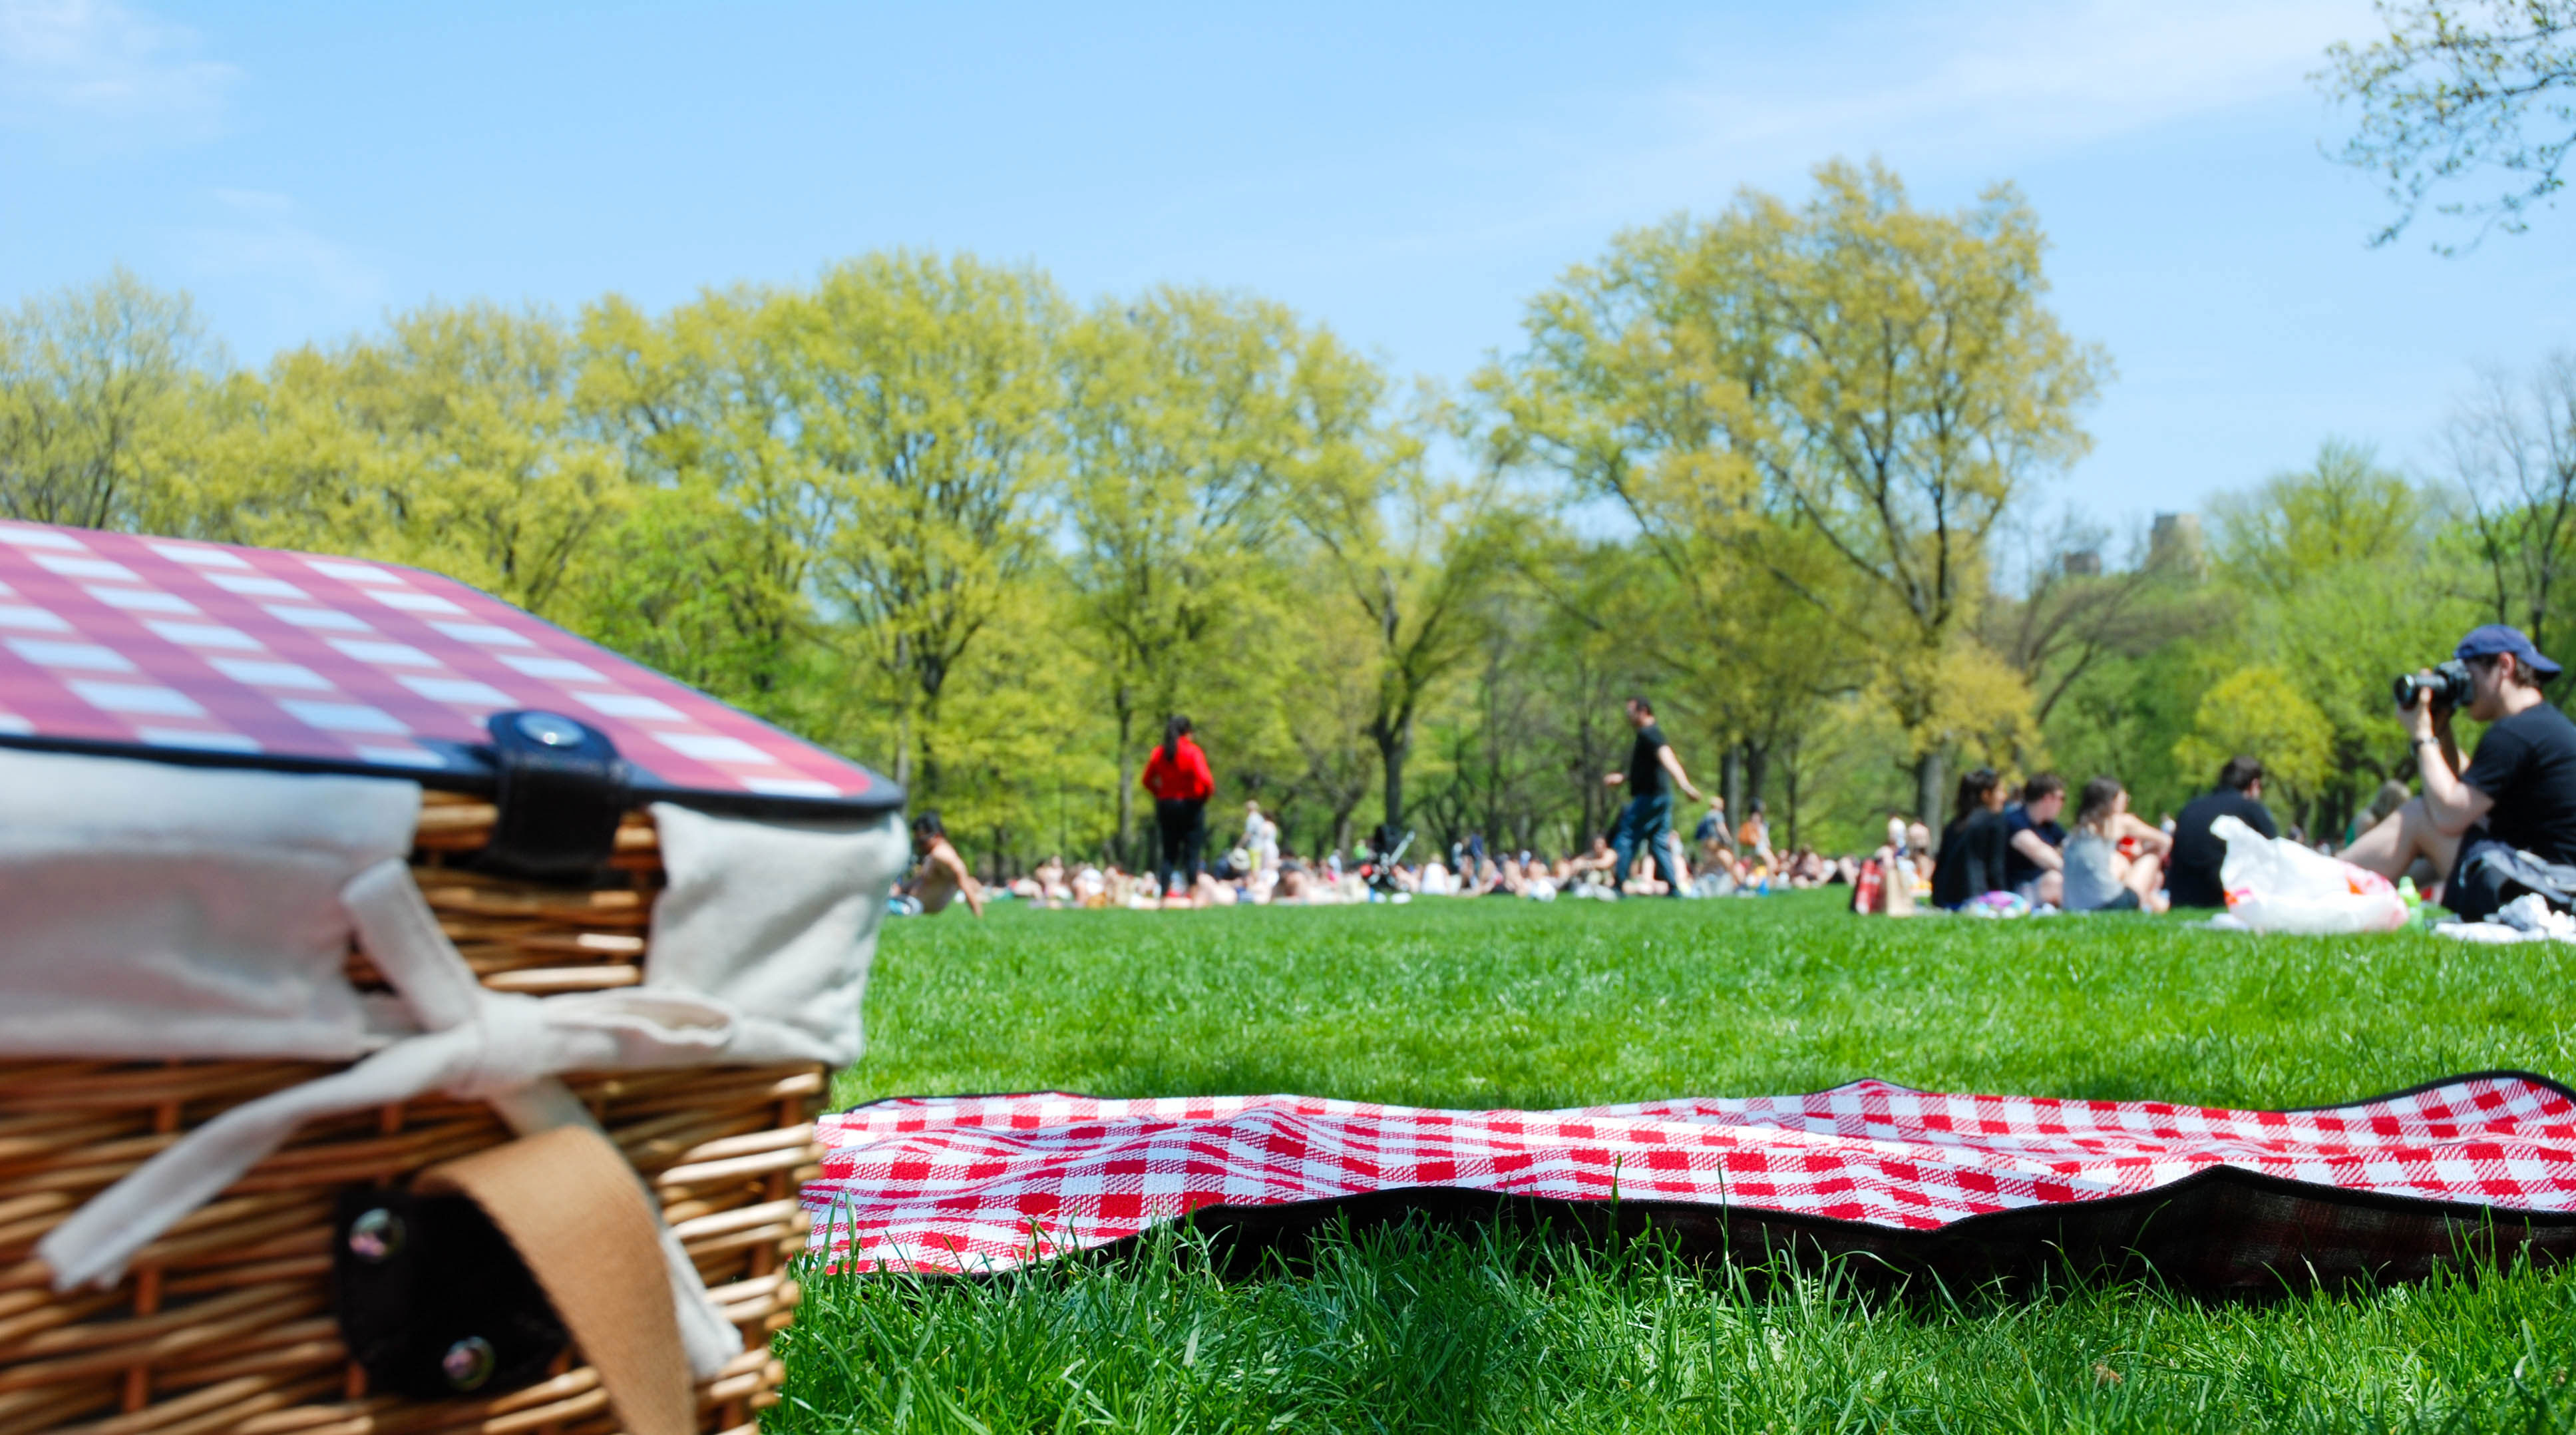 Upicnic | The smart way to picnic.